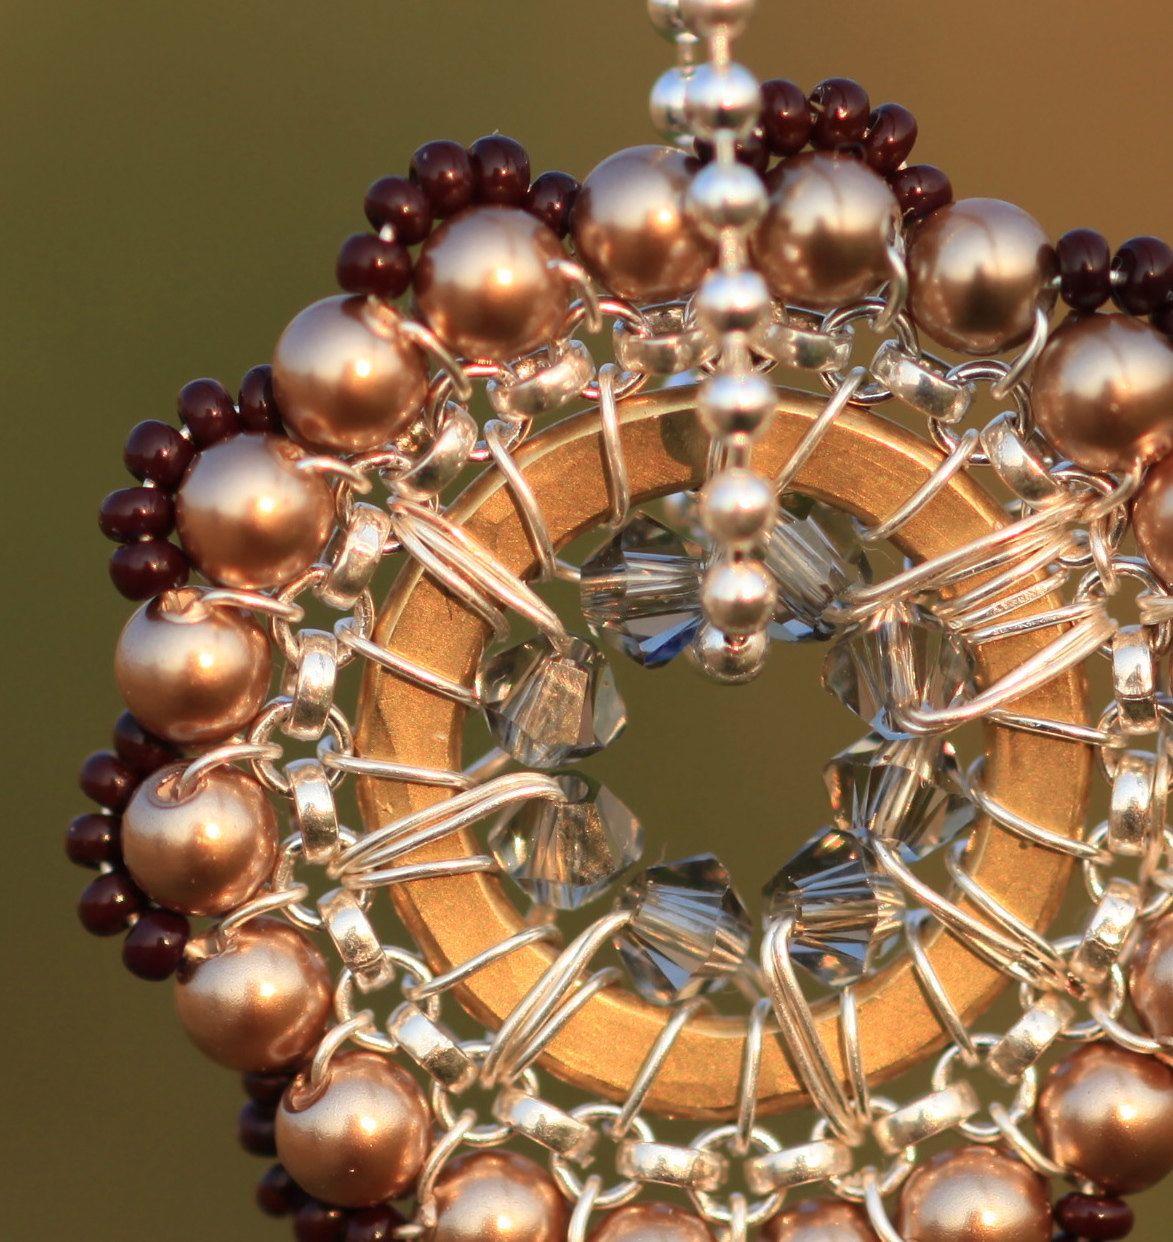 Pendant, Beadwork Necklace, Handmade, Christmas, holiday, Bridal Accessories, Cocktail, Weddings. $56.00, via Etsy.